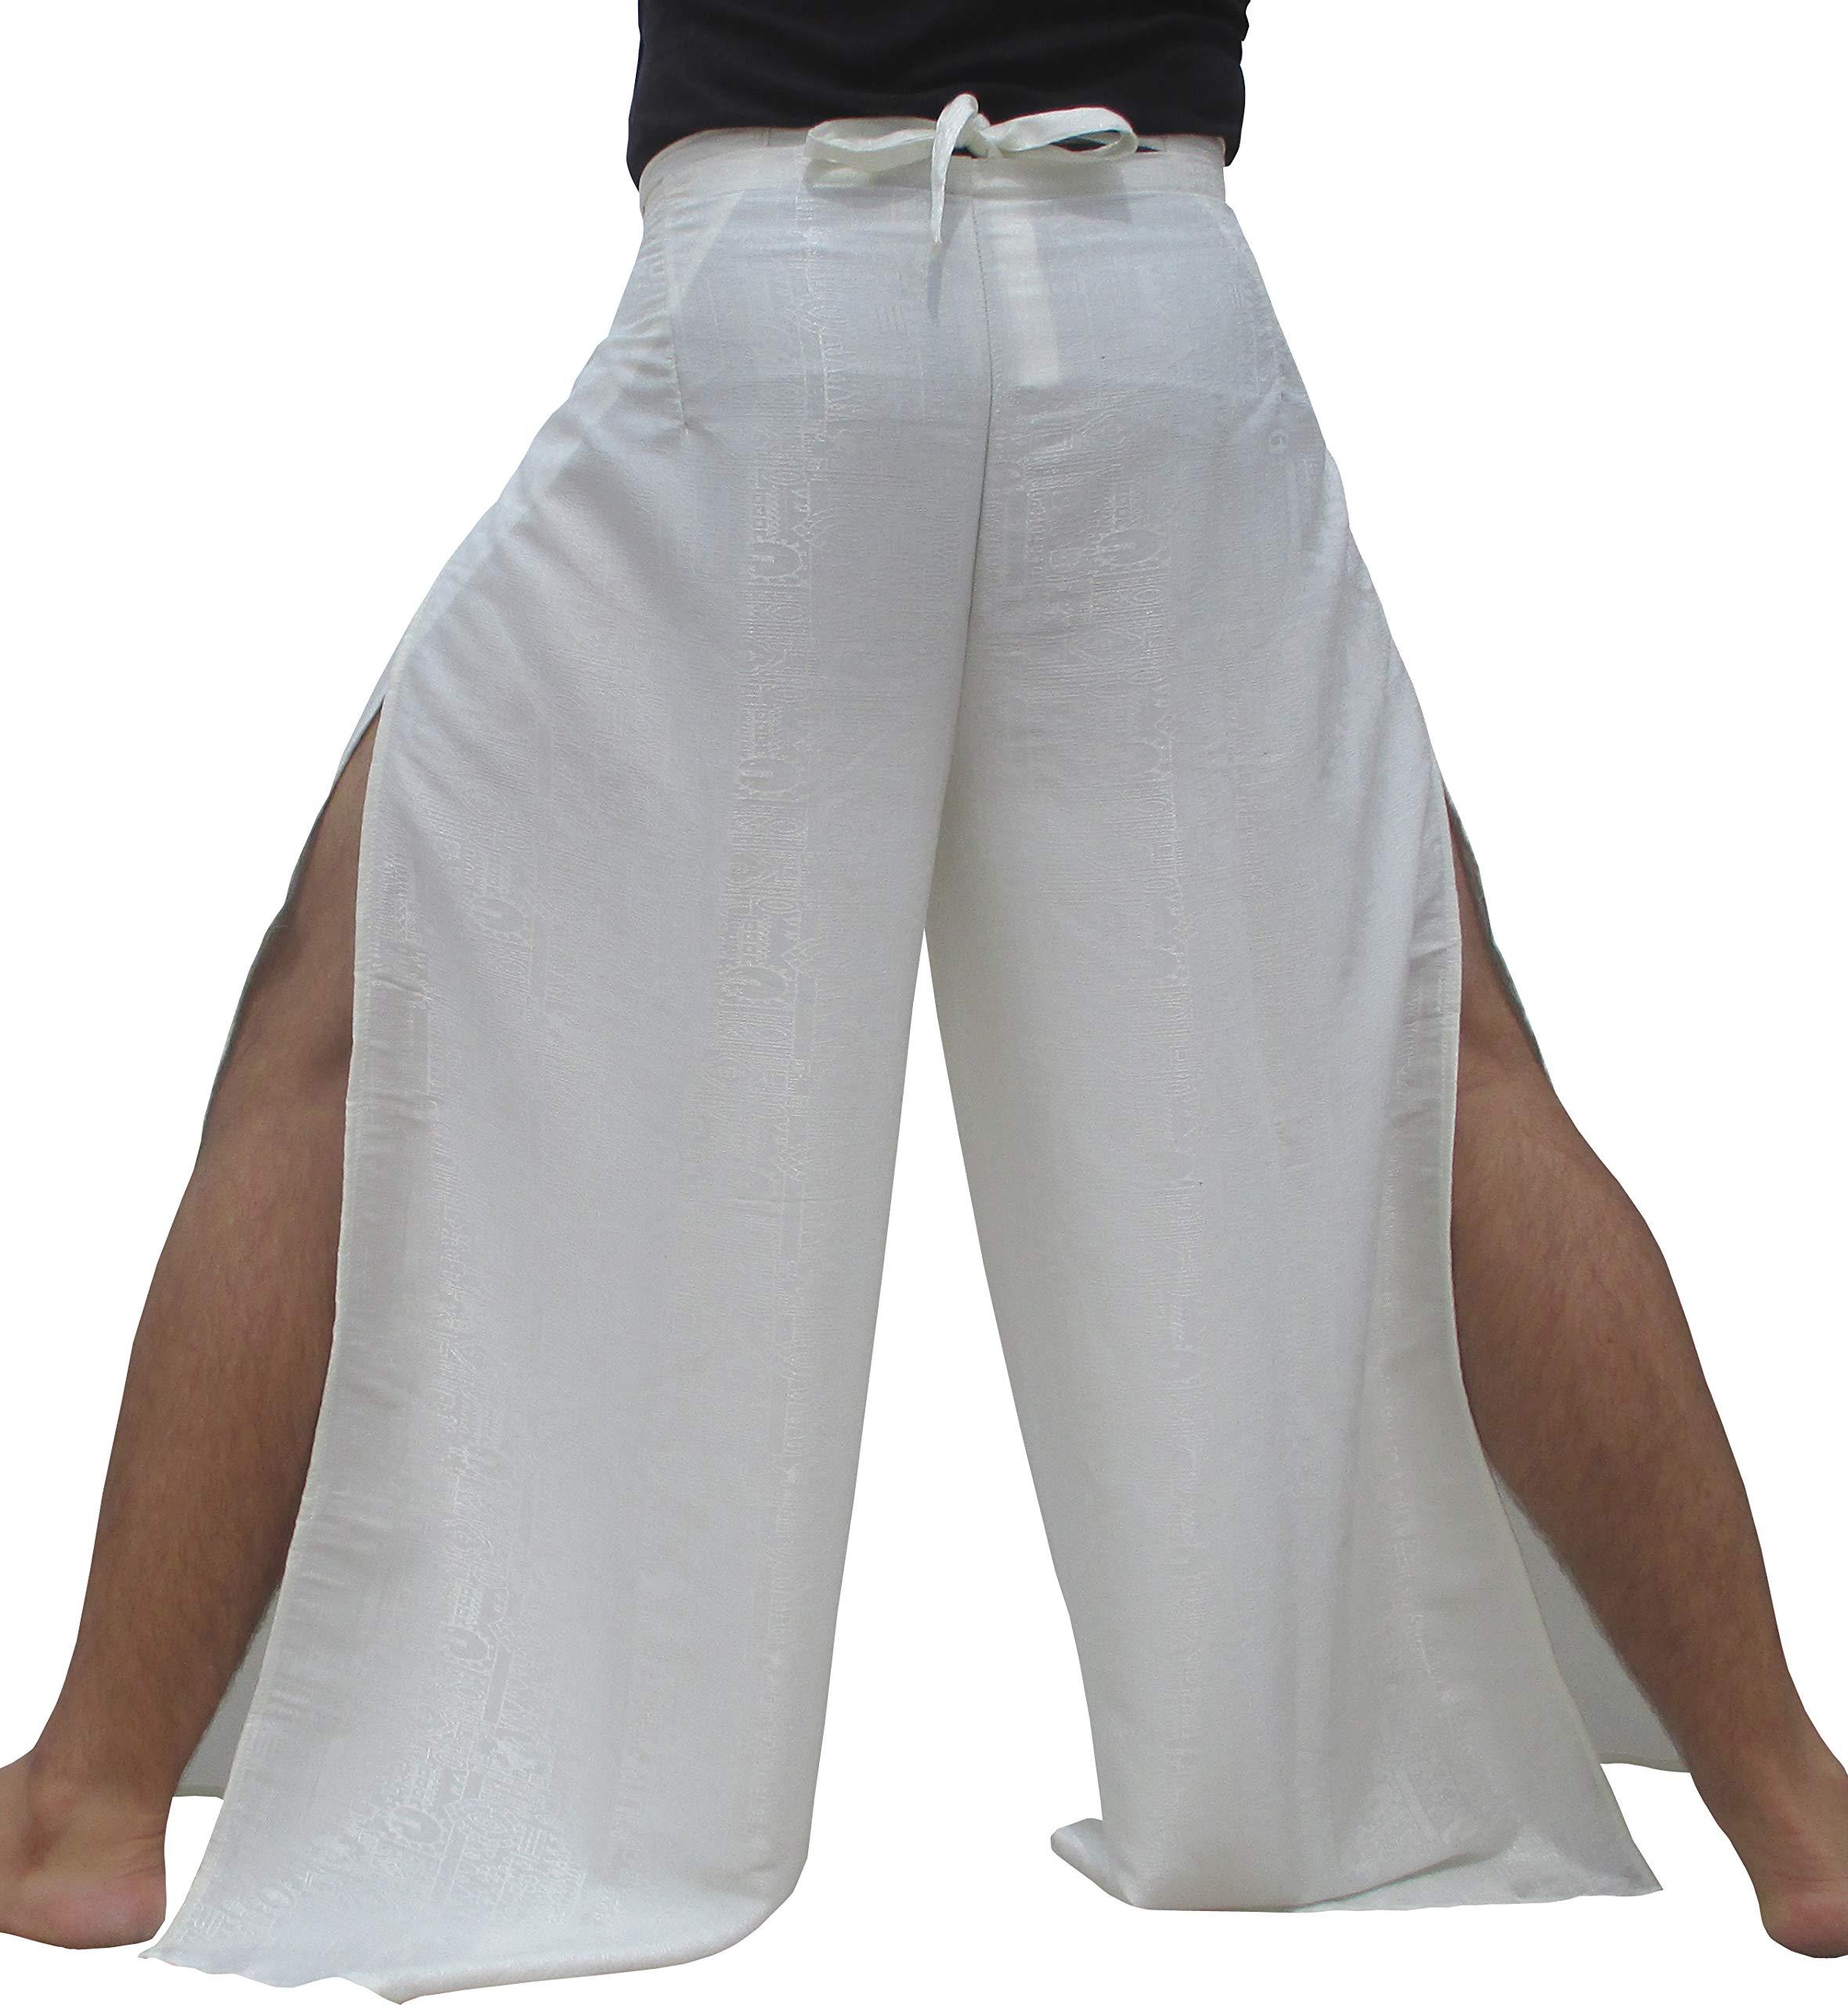 RaanPahMuang Brand Geometric Thick Textured Silk Drive In Wrap Pants, Medium, Cream by RaanPahMuang